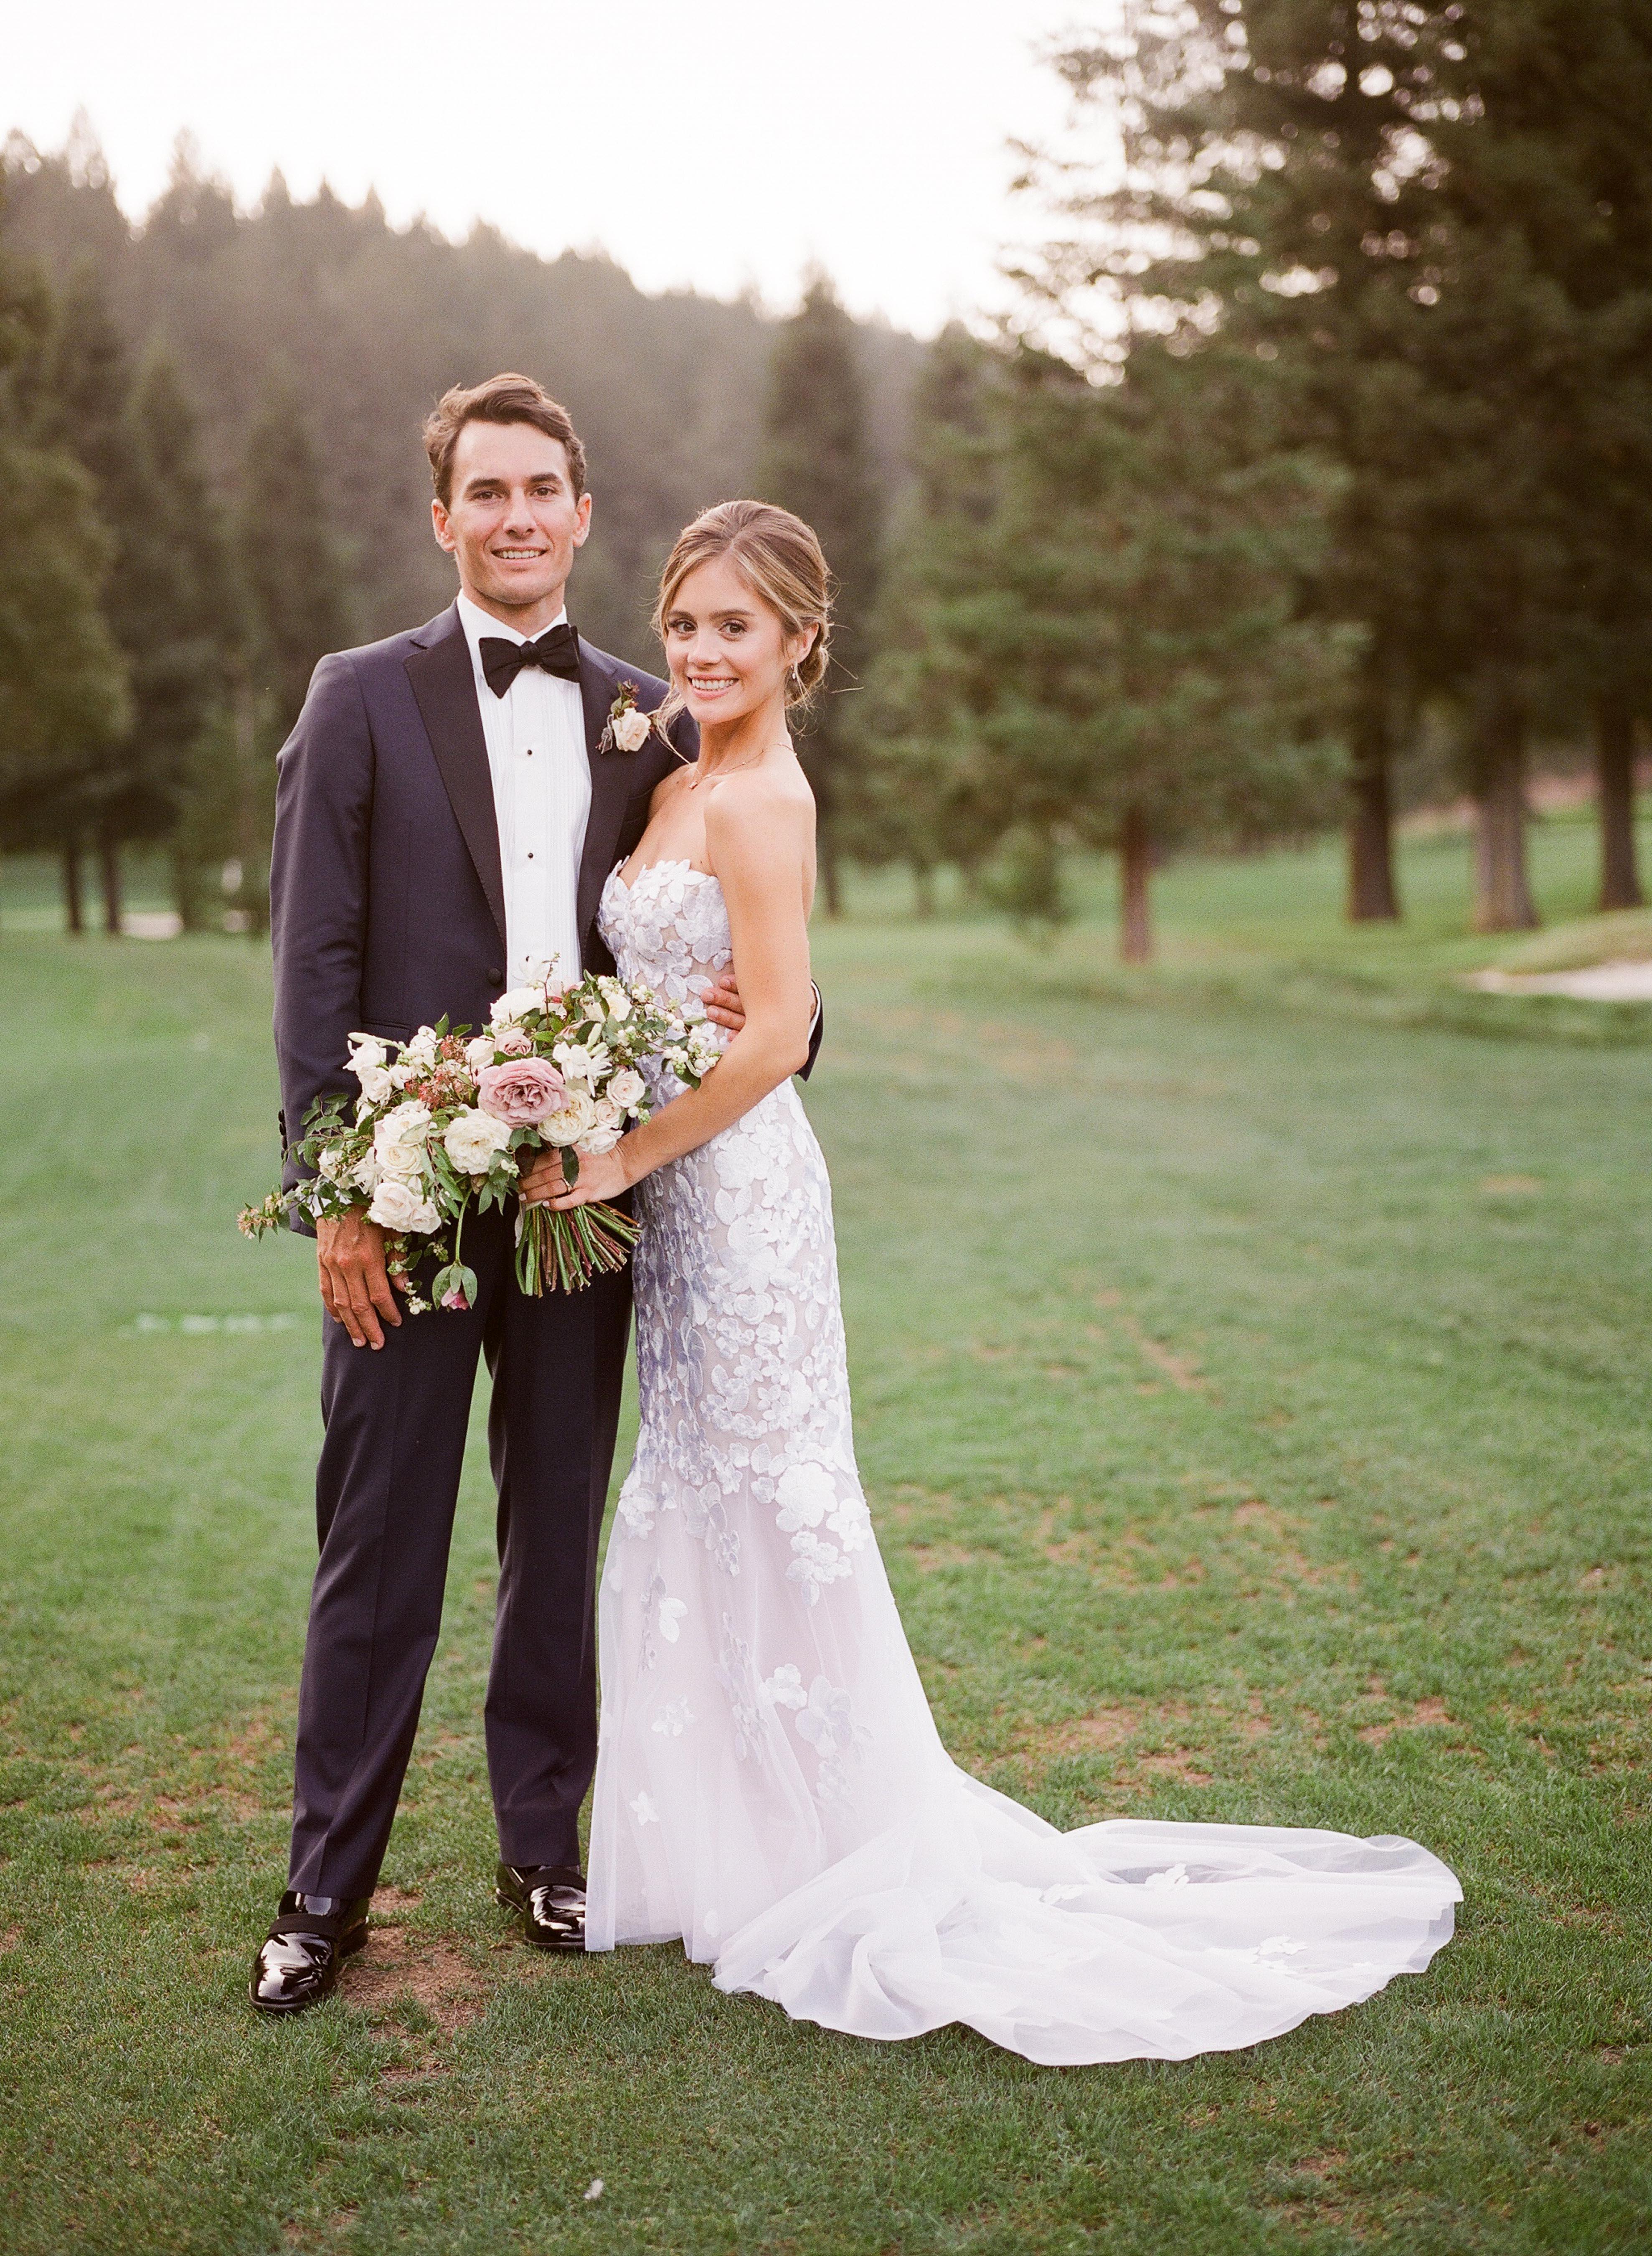 caitlin michael wedding couple on lawn